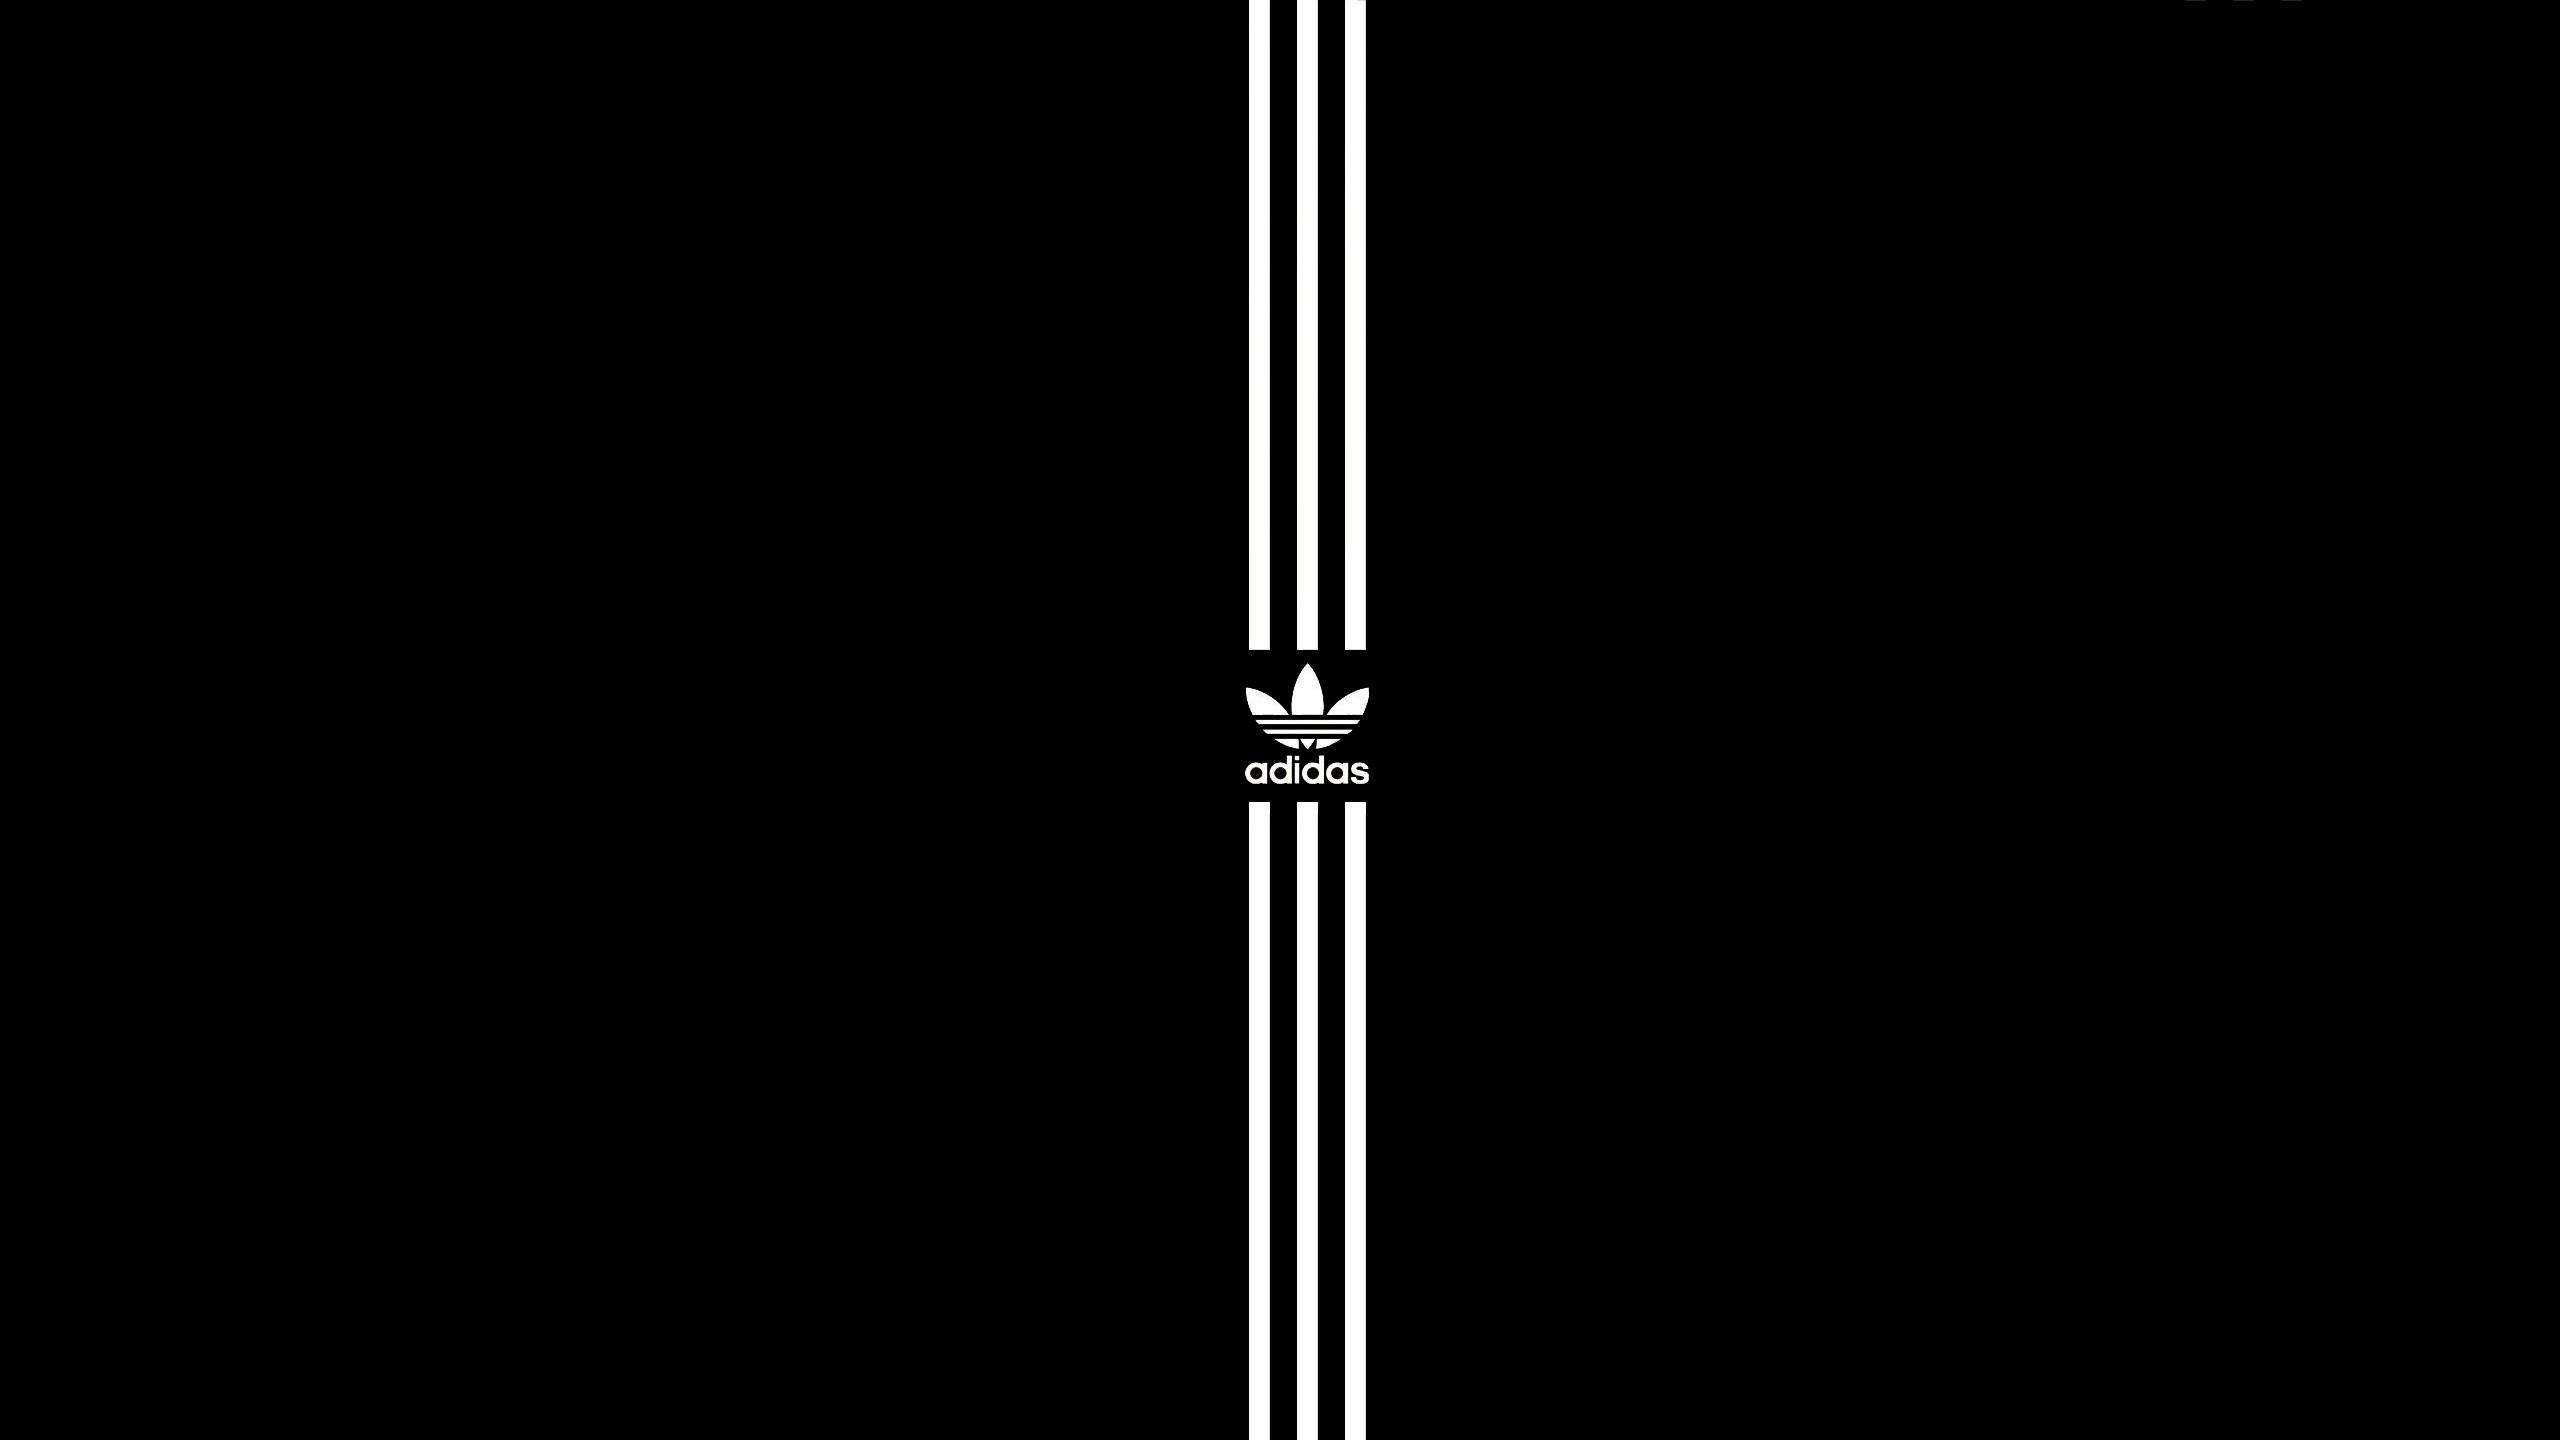 sports iphone wallpaper, adidas iphone 5 wallpaper